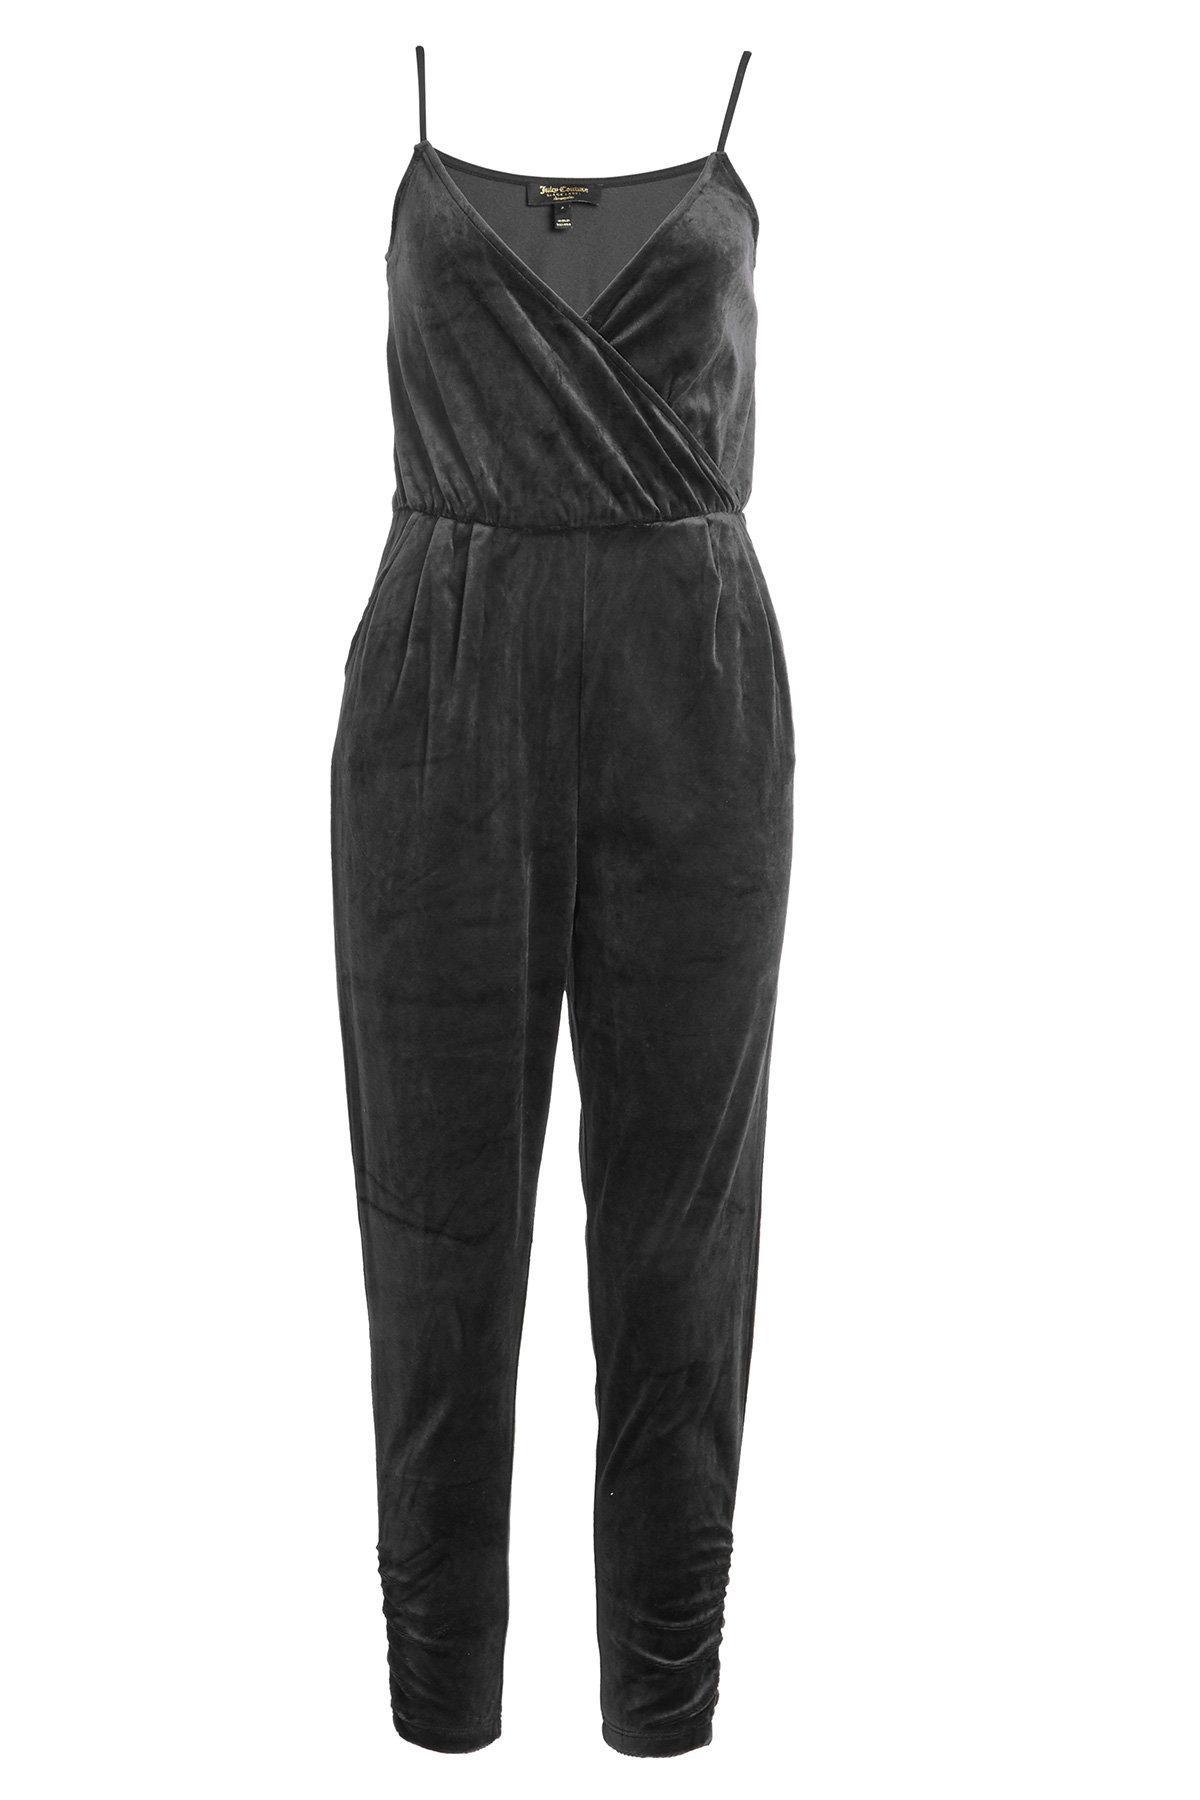 Juicy Couture Velvet Jumpsuit In Black